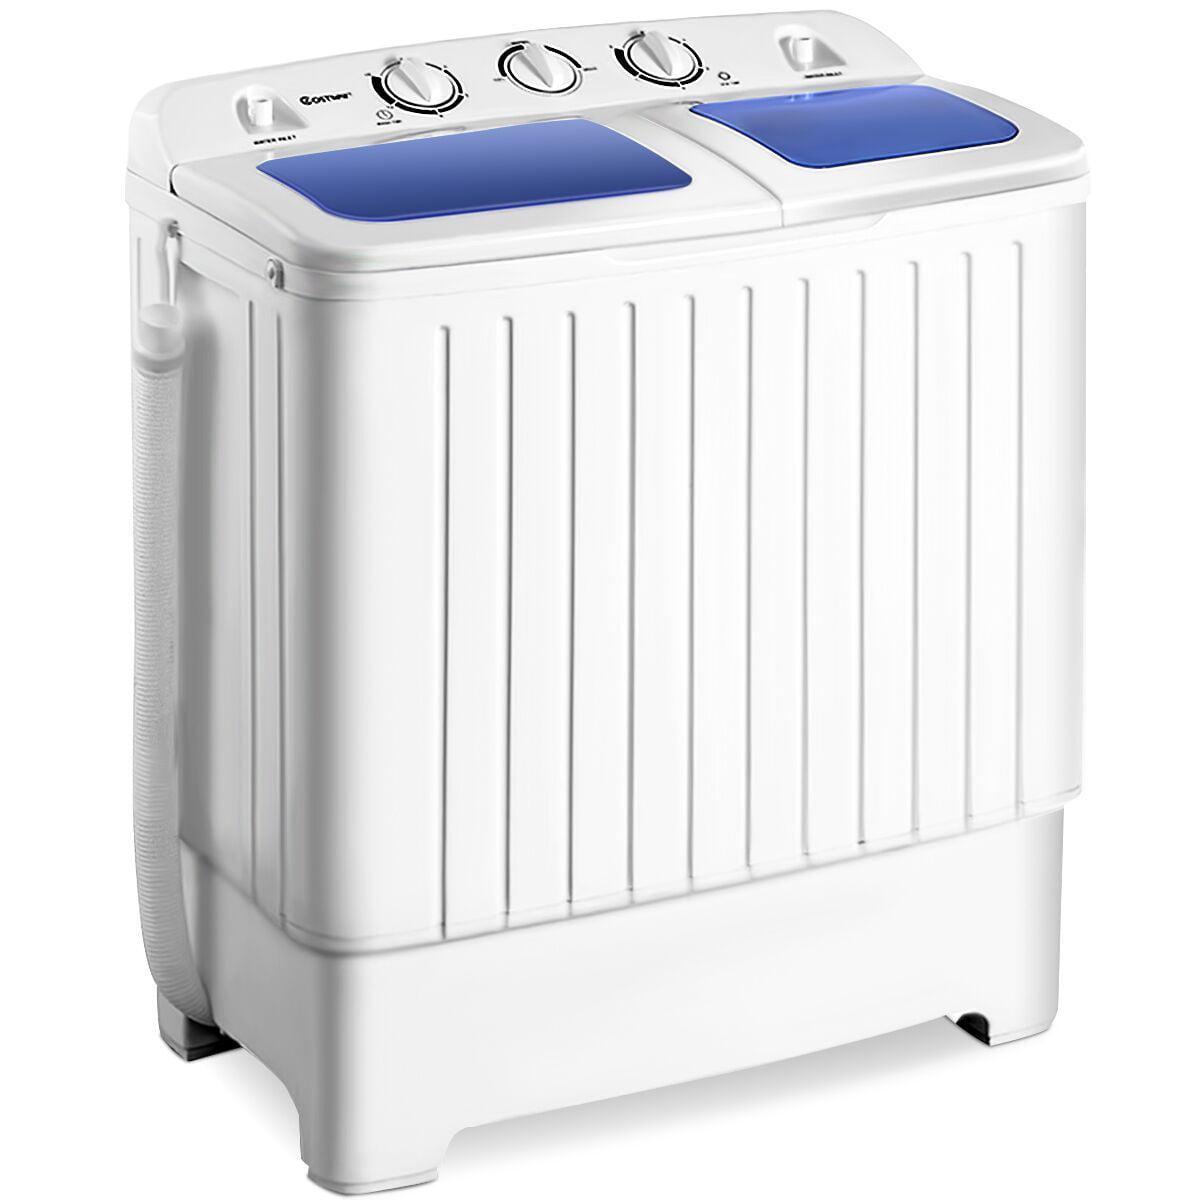 Costway Portable Mini Compact Twin Tub 17.6lb Washing Machine Washer Spin  Dryer - Walmart.com